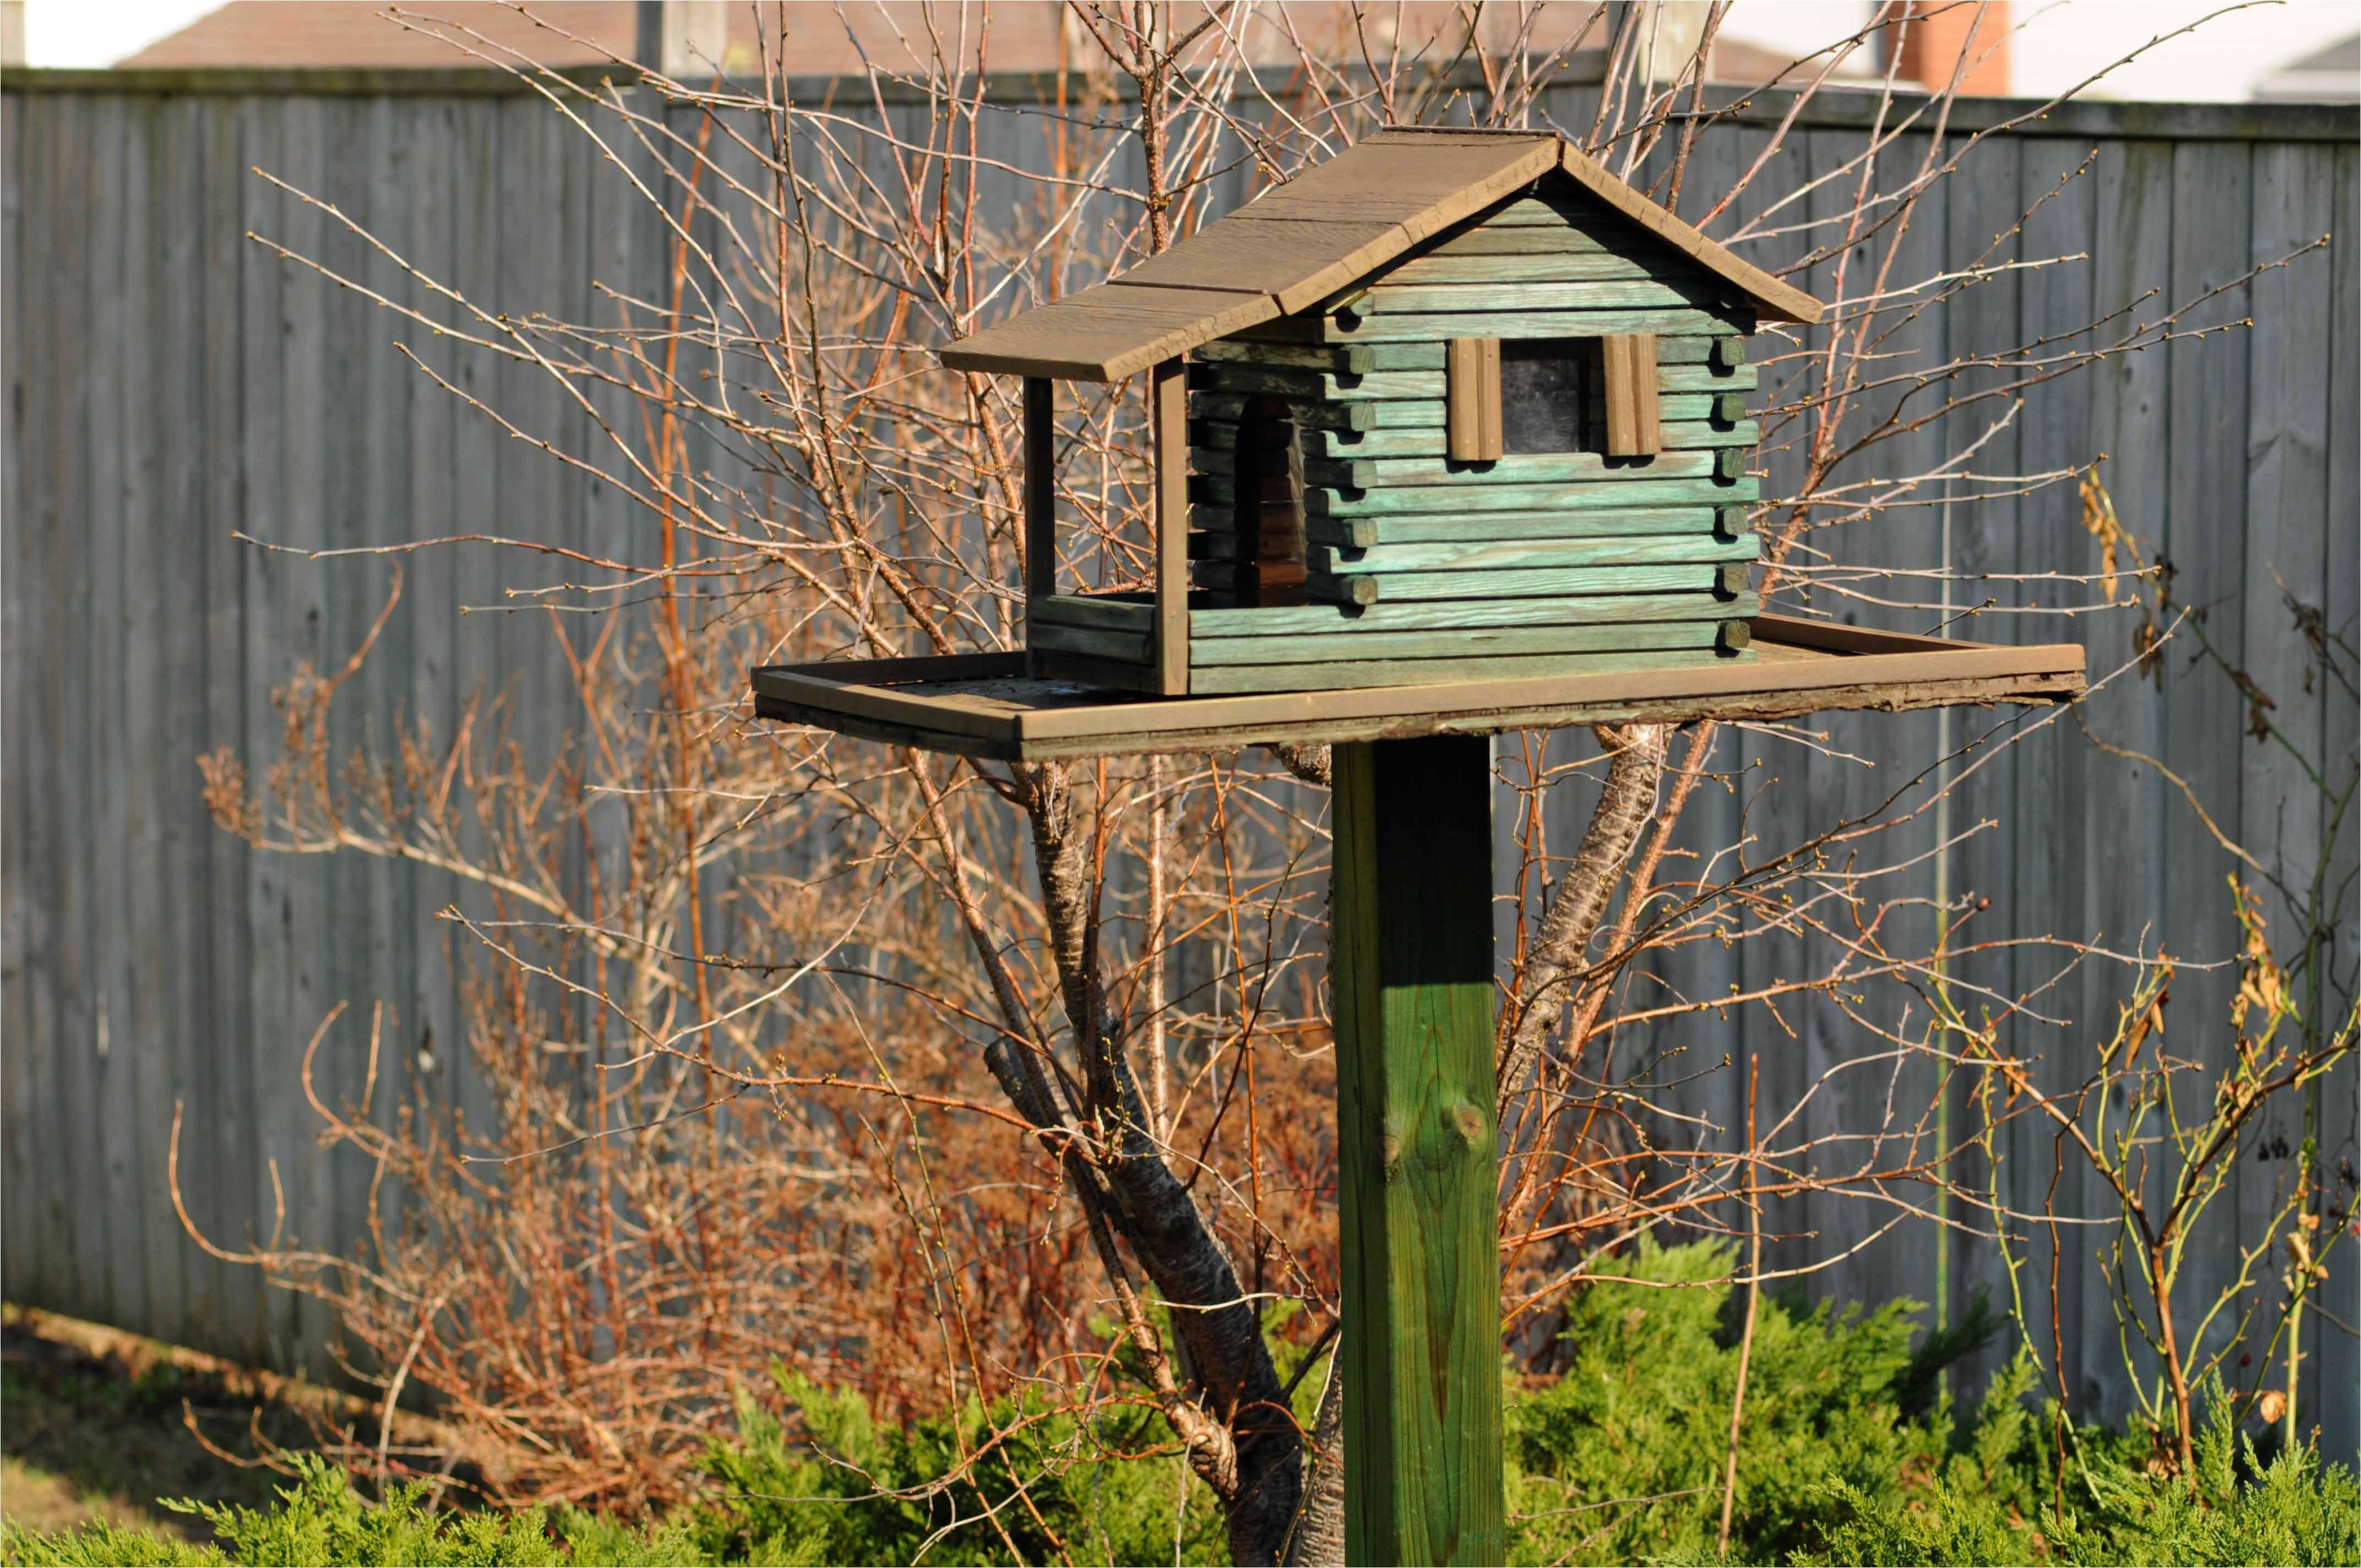 yti2y giant bird house plans